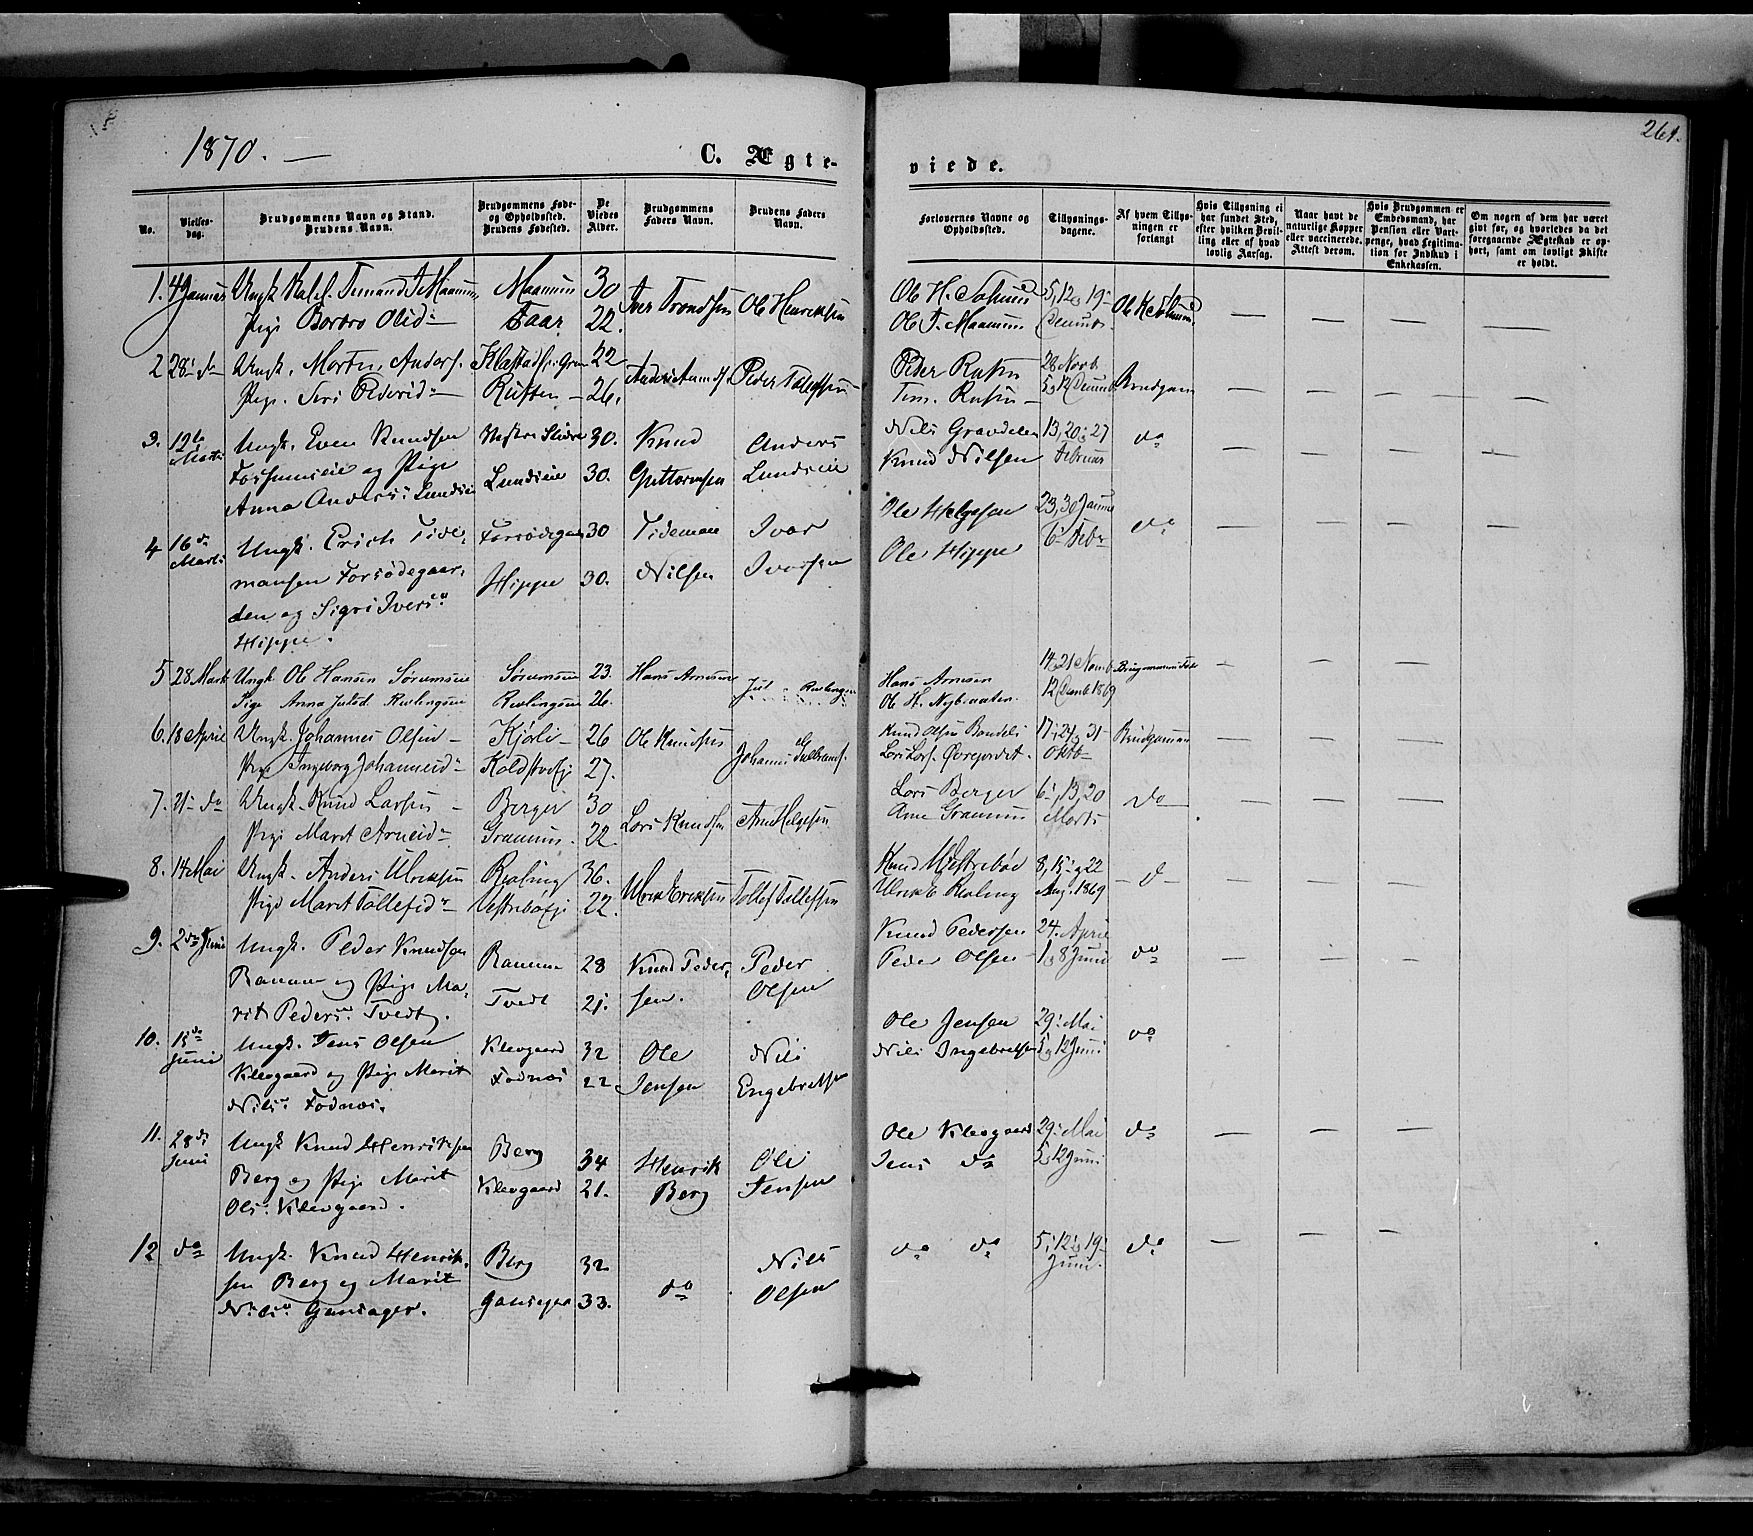 SAH, Nord-Aurdal prestekontor, Ministerialbok nr. 8, 1863-1875, s. 261